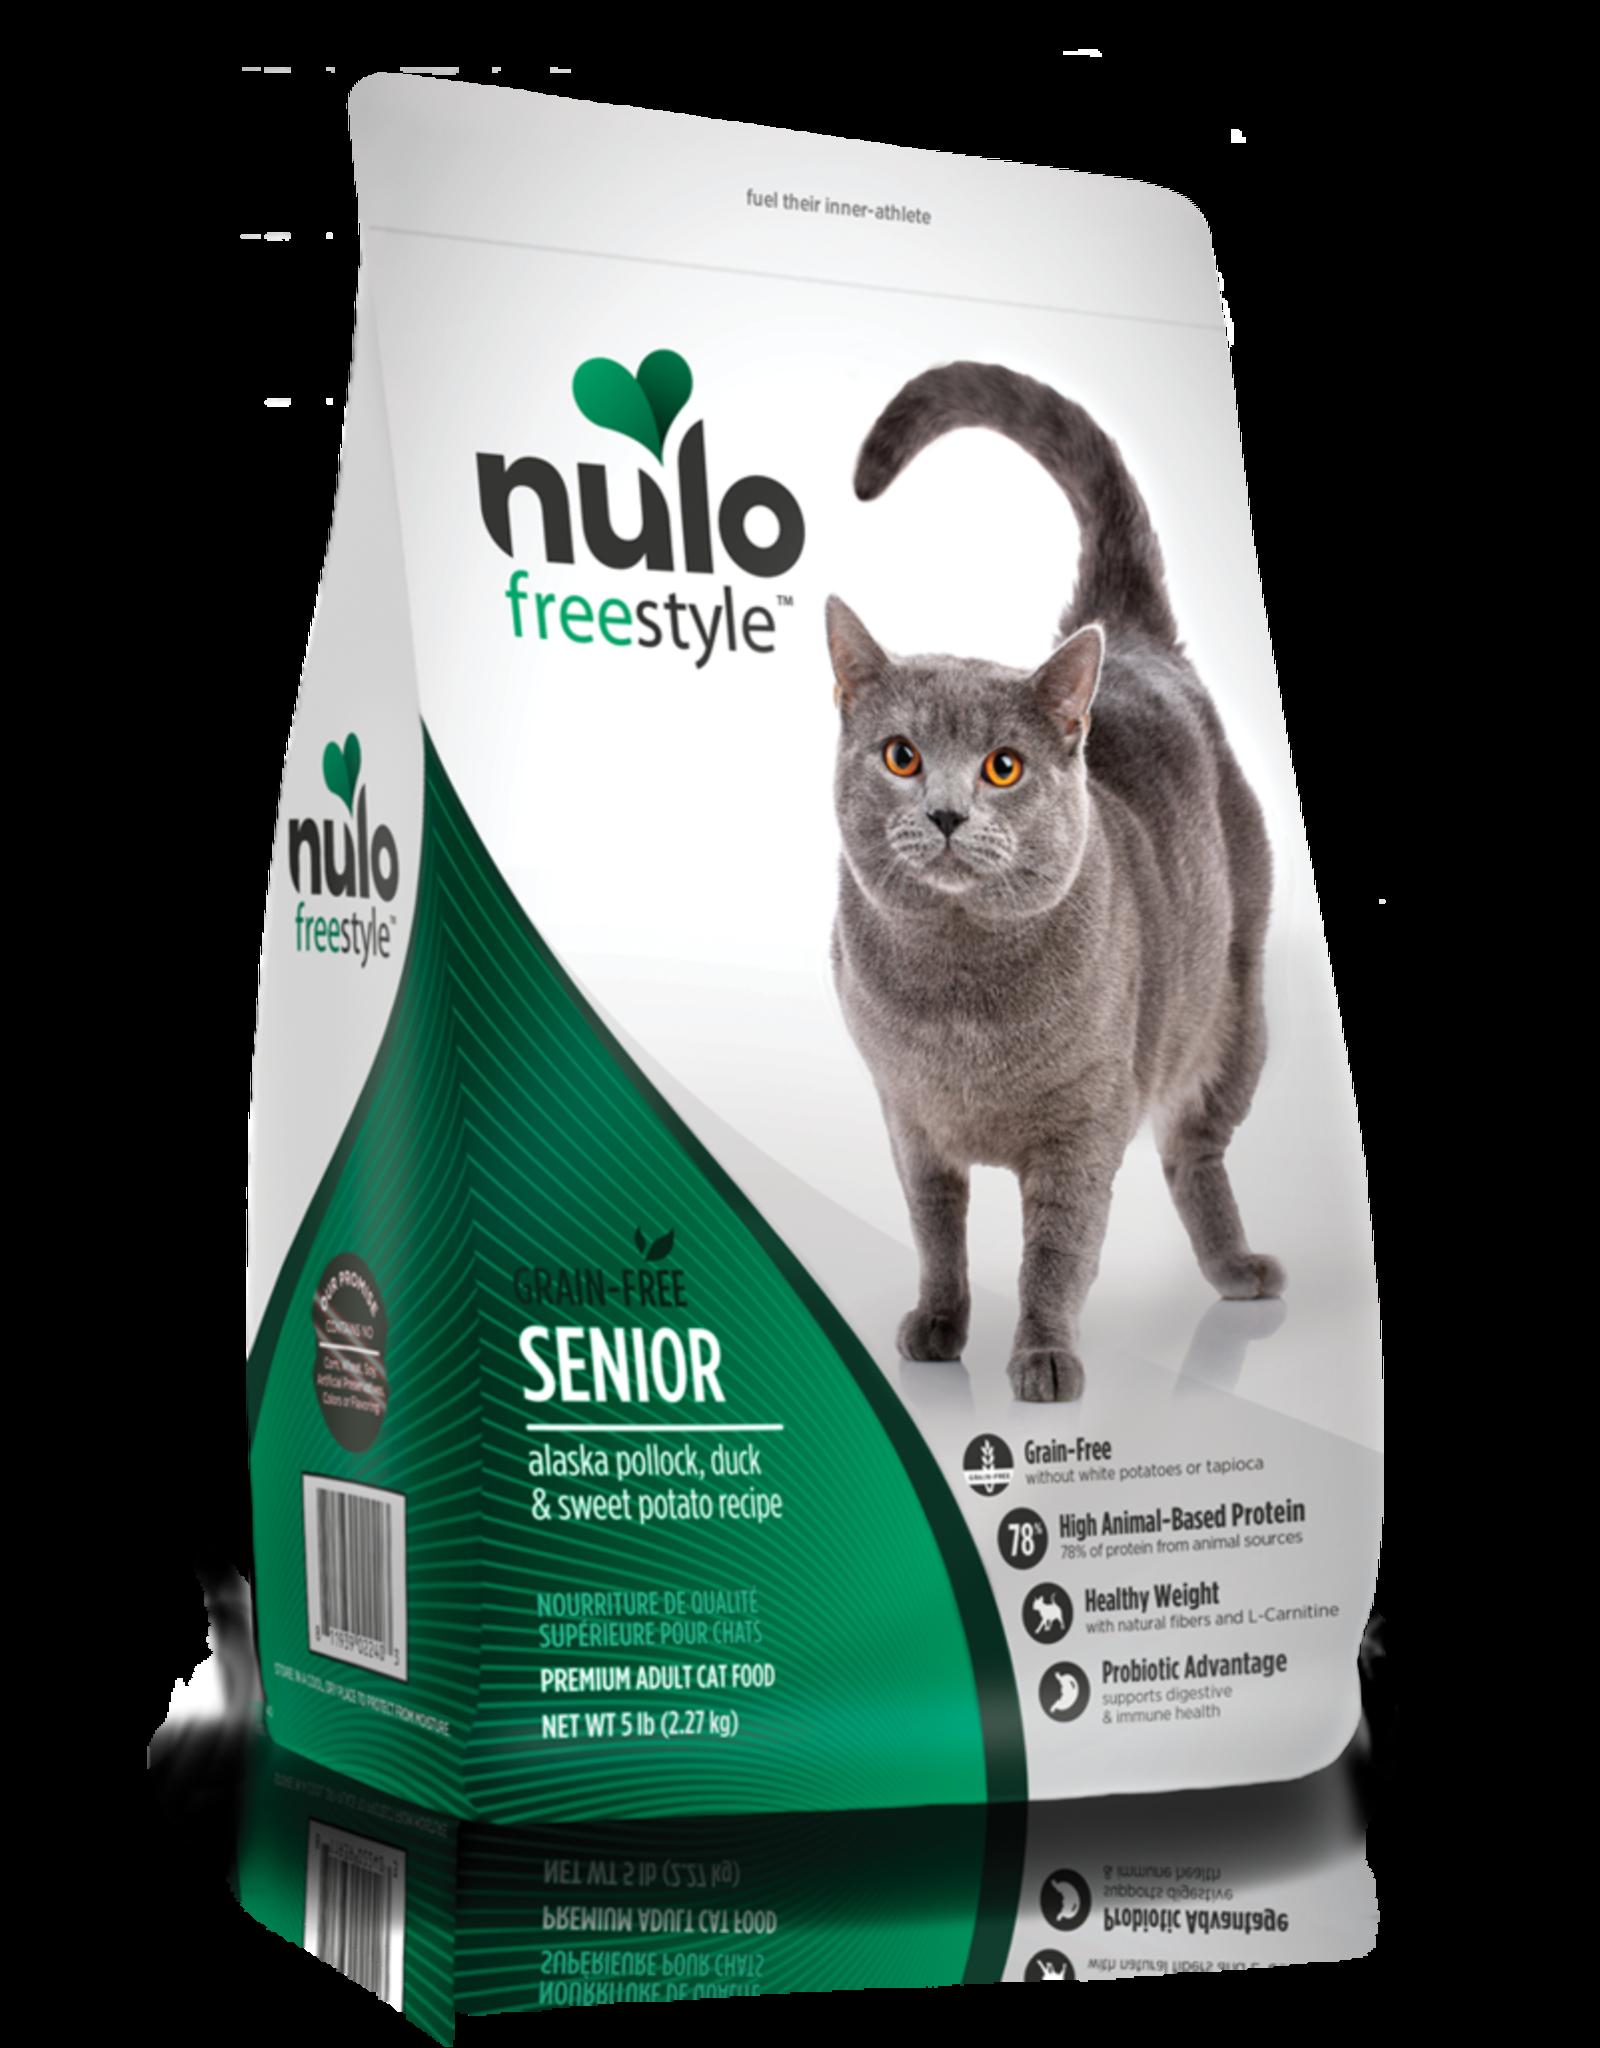 Nulo Nulo Dry Cat Food Freestyle Senior Alaska Pollock, Duck, & Sweet Potatoes Recipe Grain Free